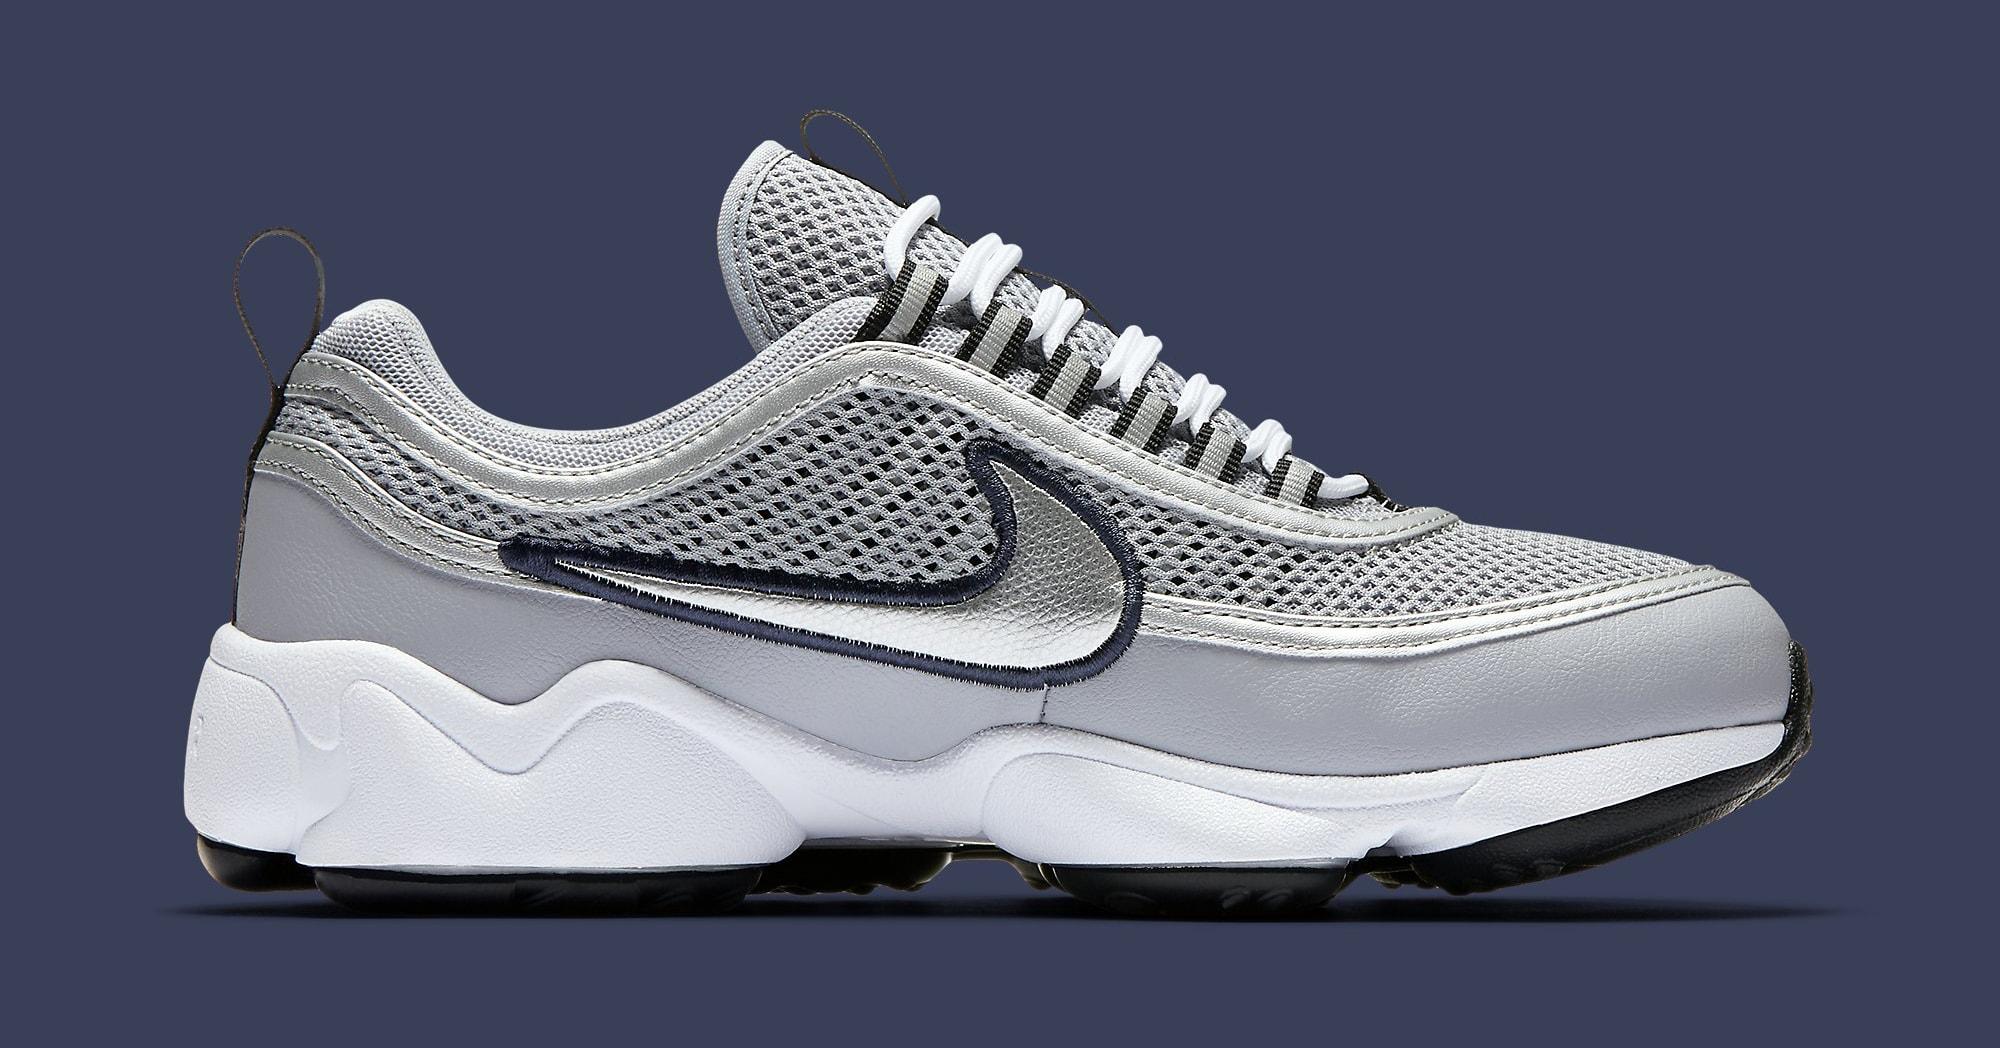 Nike Air Zoom Spiridon Womens Grey Navy 905221 001 | Sole